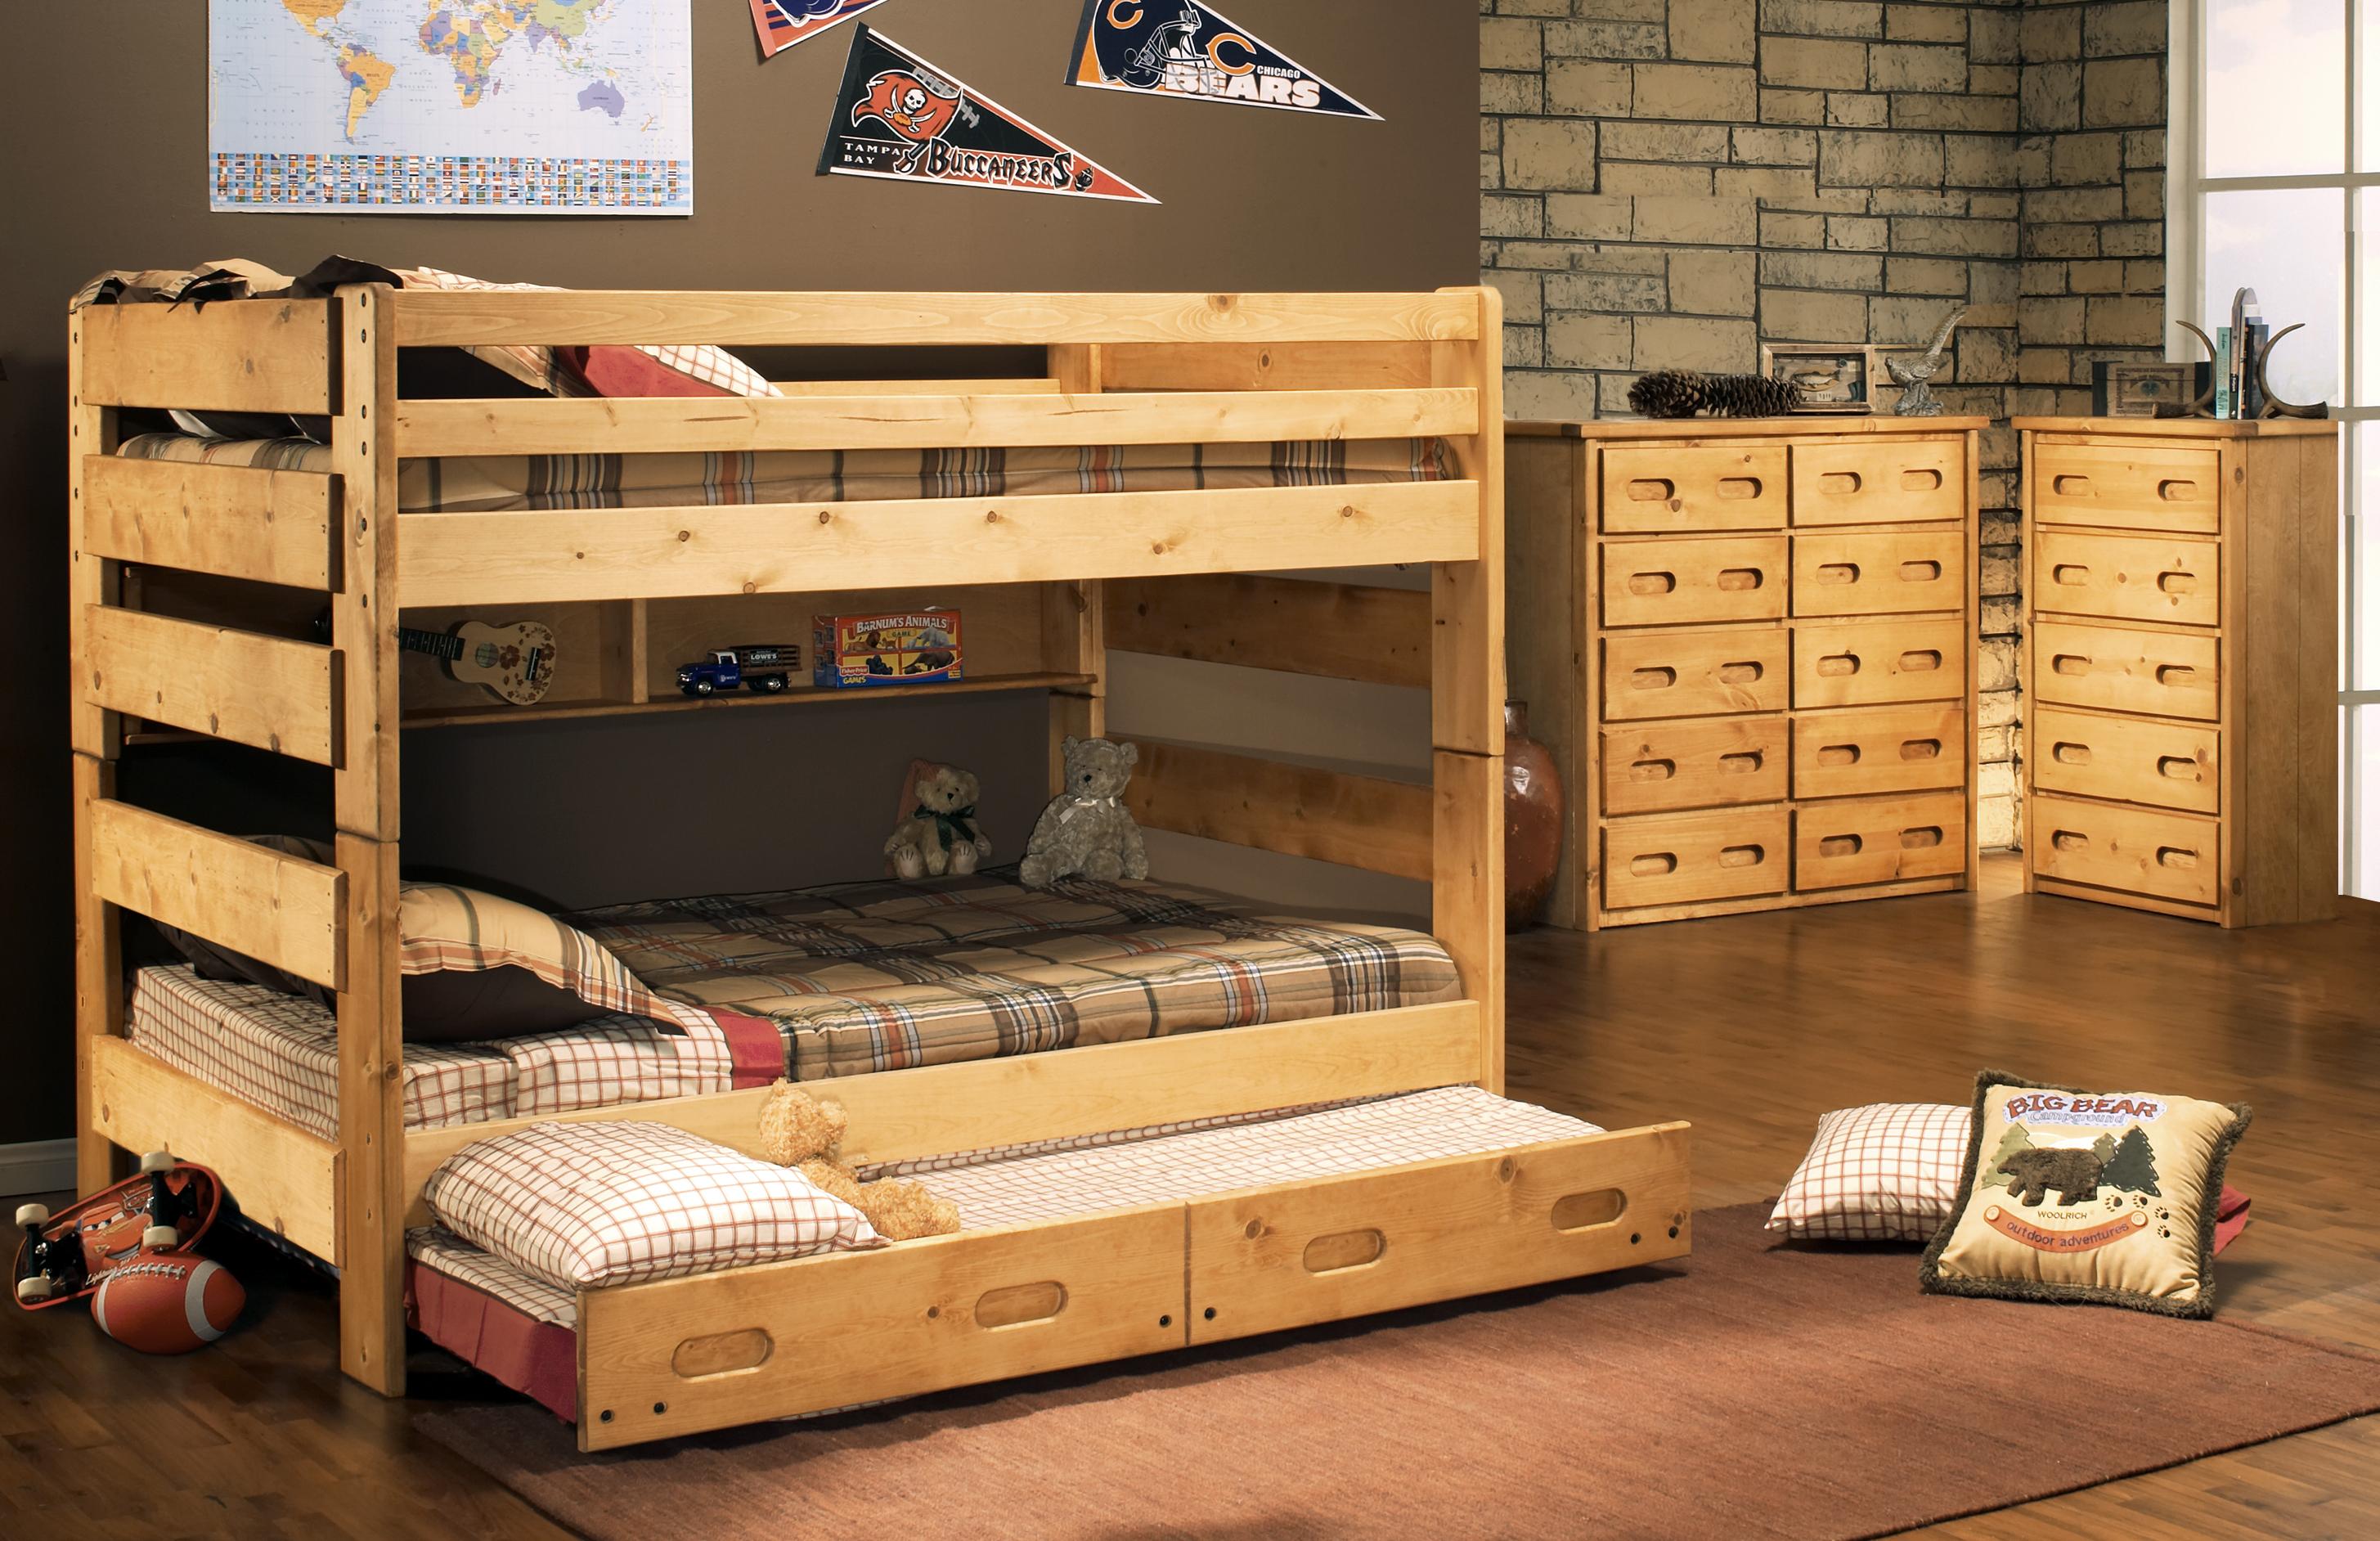 Trendwood Bunkhouse Big Sky Youth Bunk Bed Frame Full Full 4144